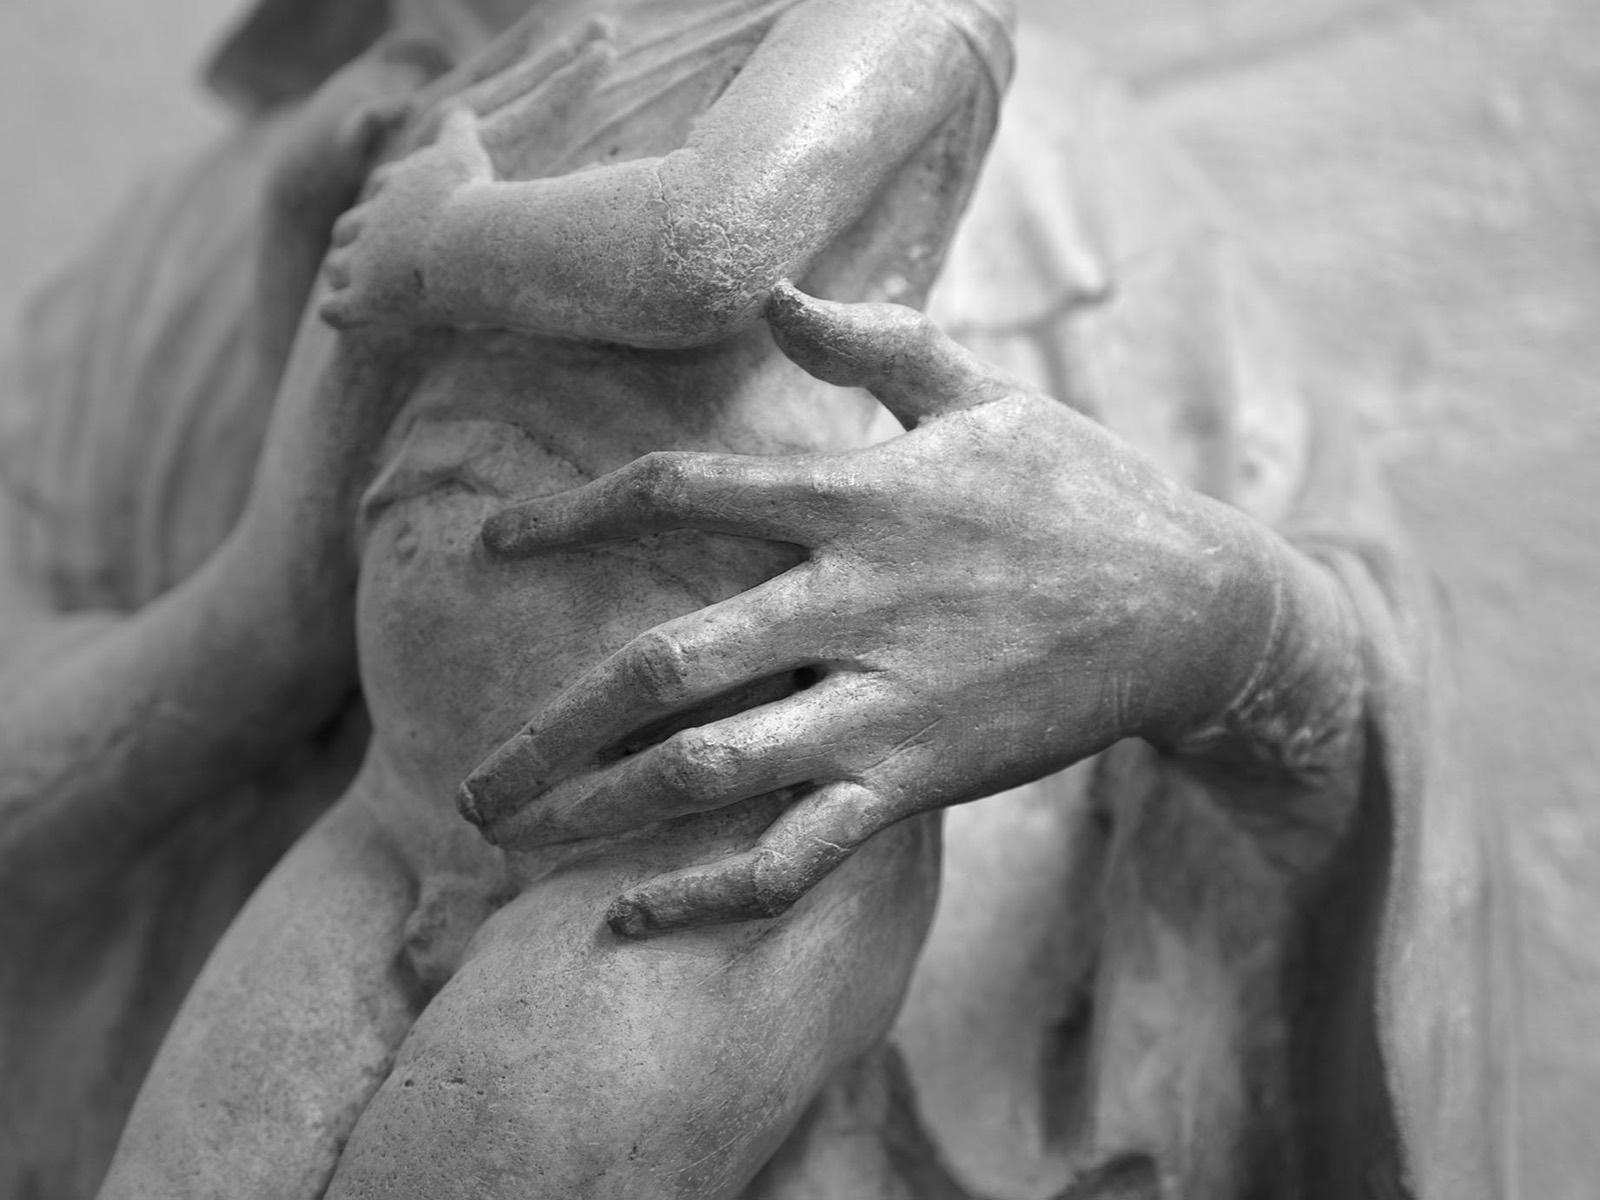 Monastere ecarlate pierre de rencontre